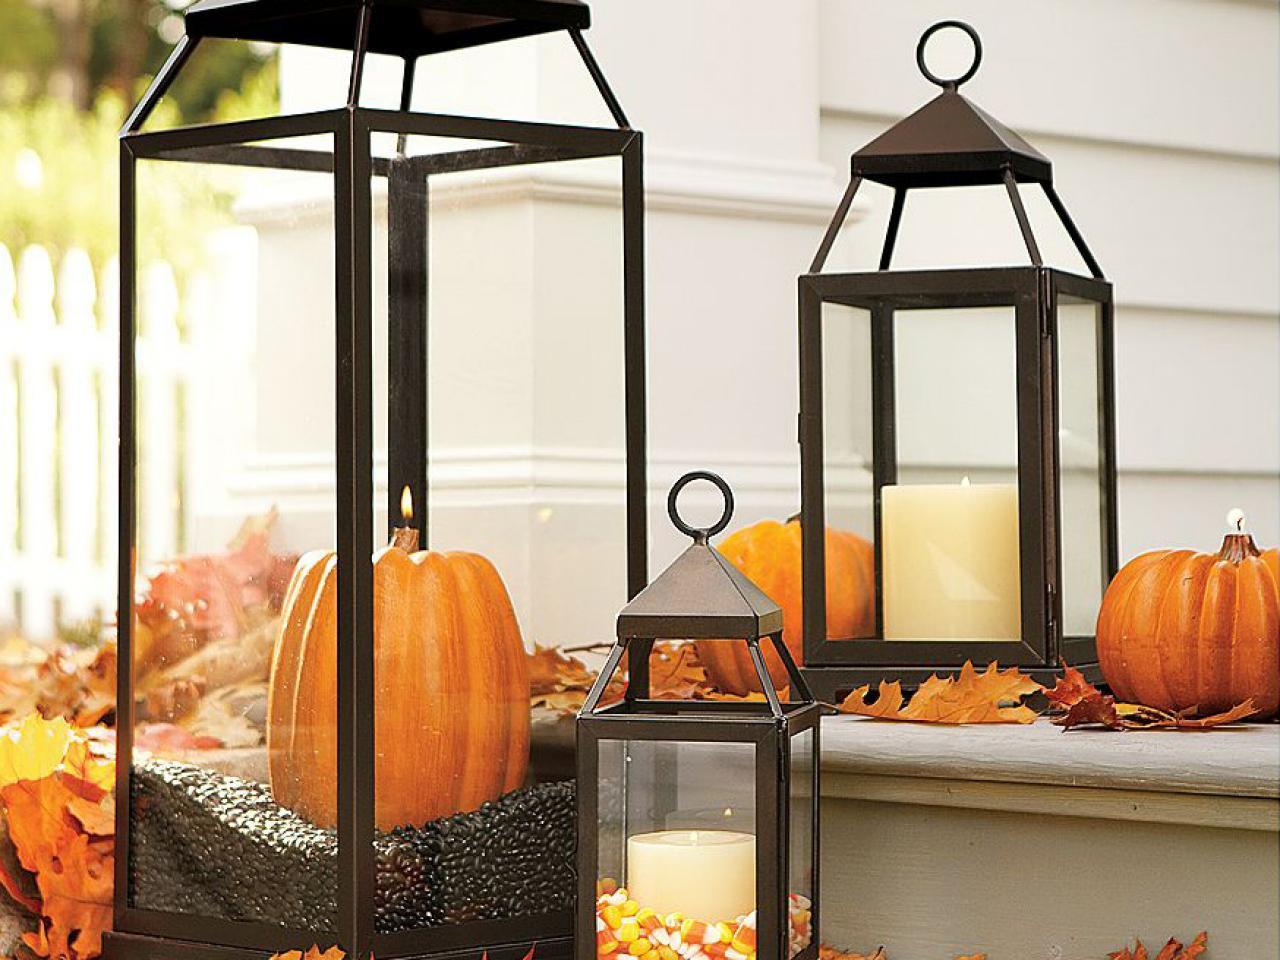 Your Favorite Fall Decor And Craft Pins Hgtv S Decorating Design Blog Hgtv